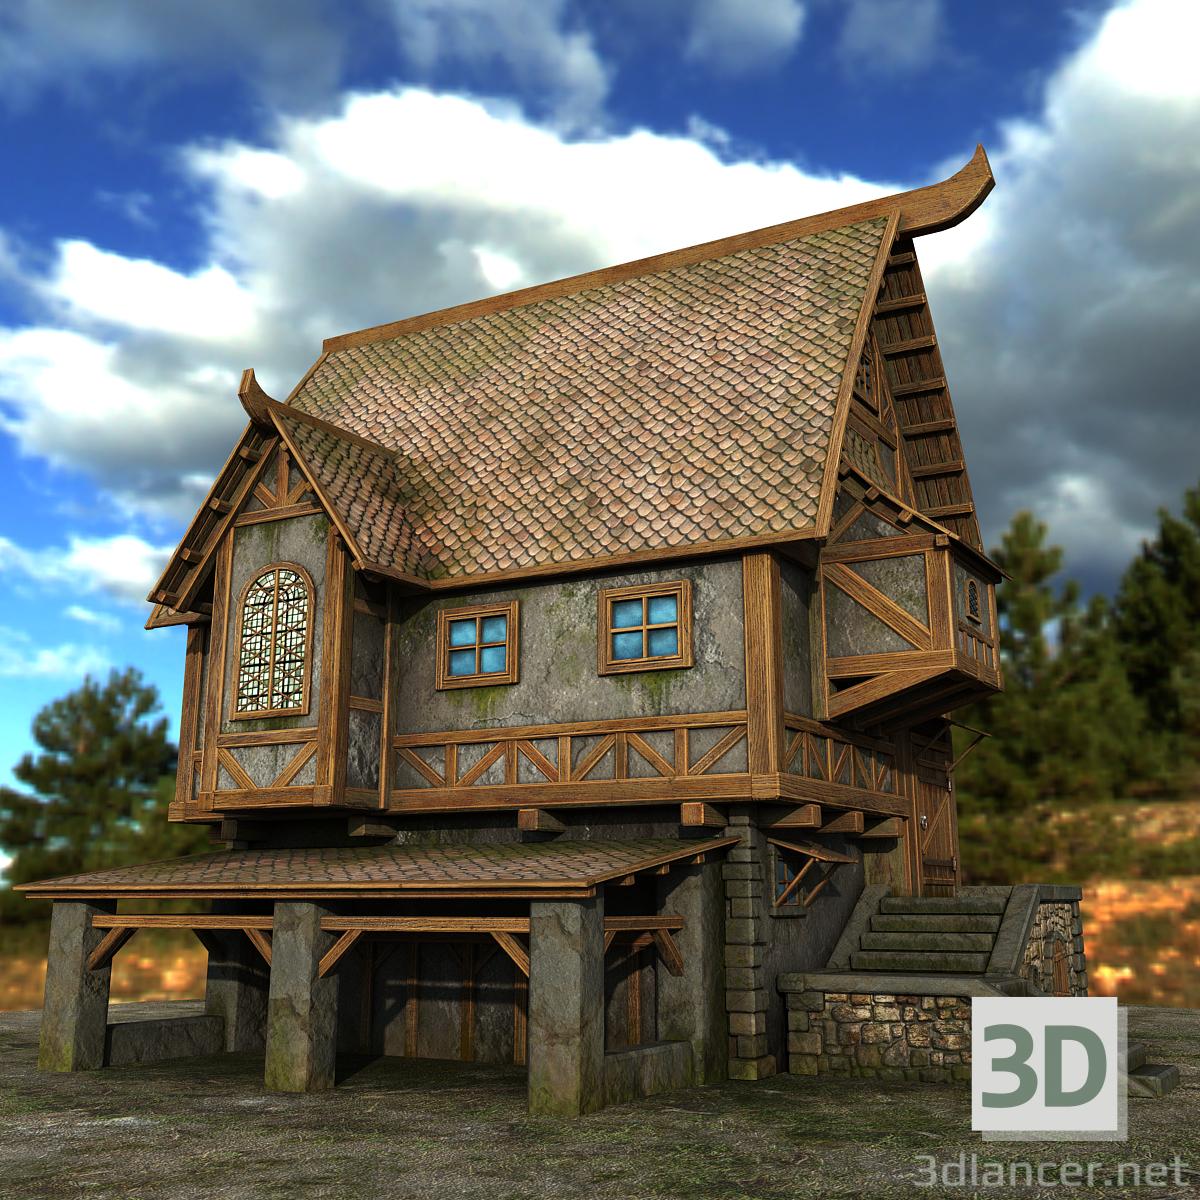 3d Country house model buy - render